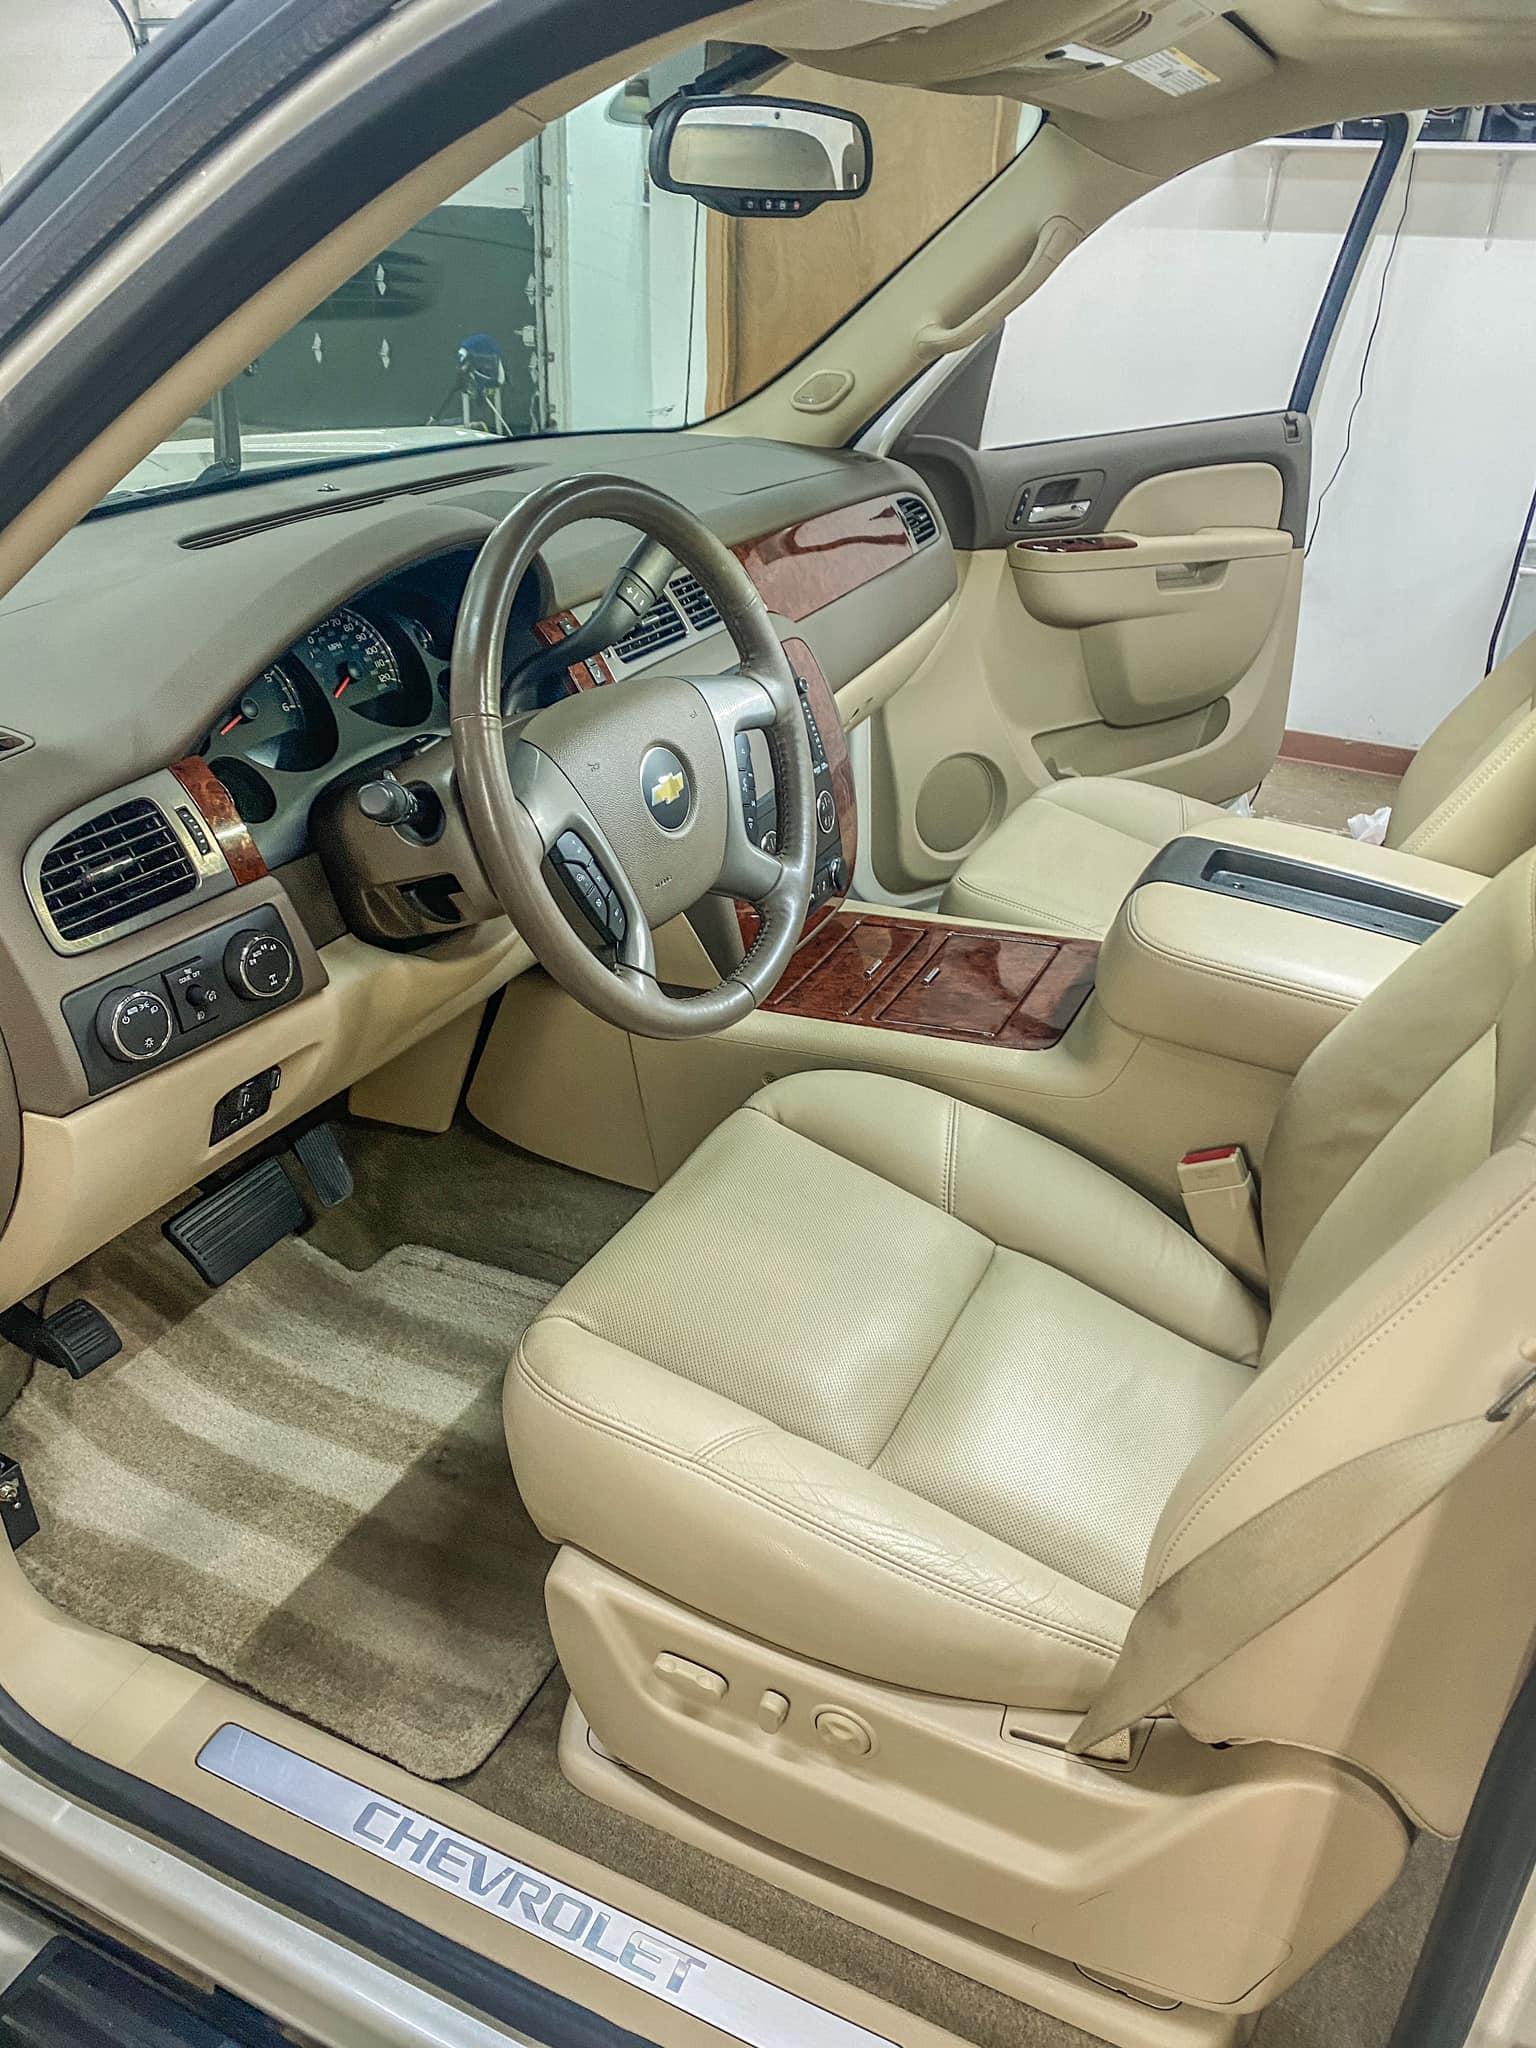 Interior Detail (CAR)